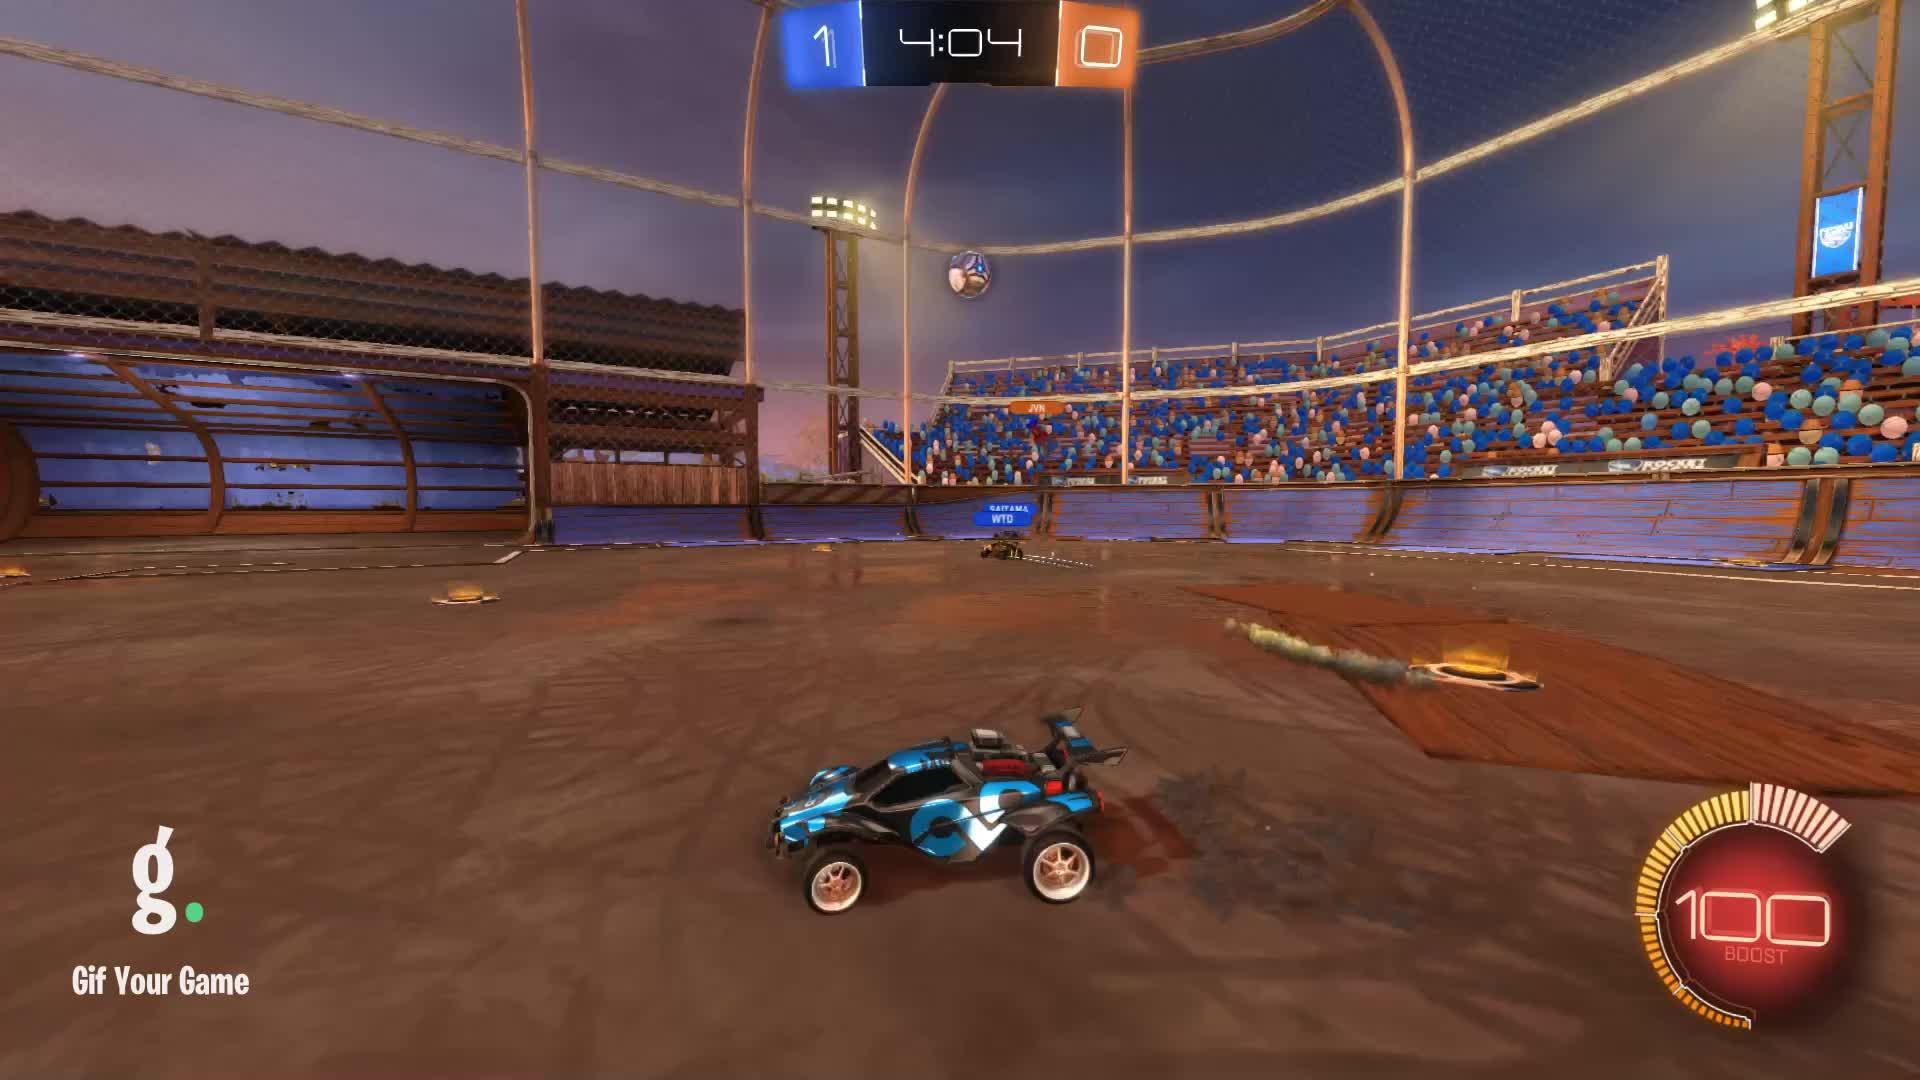 Gif Your Game, GifYourGame, Goal, K2, Rocket League, RocketLeague, Goal 2: K2 GIFs